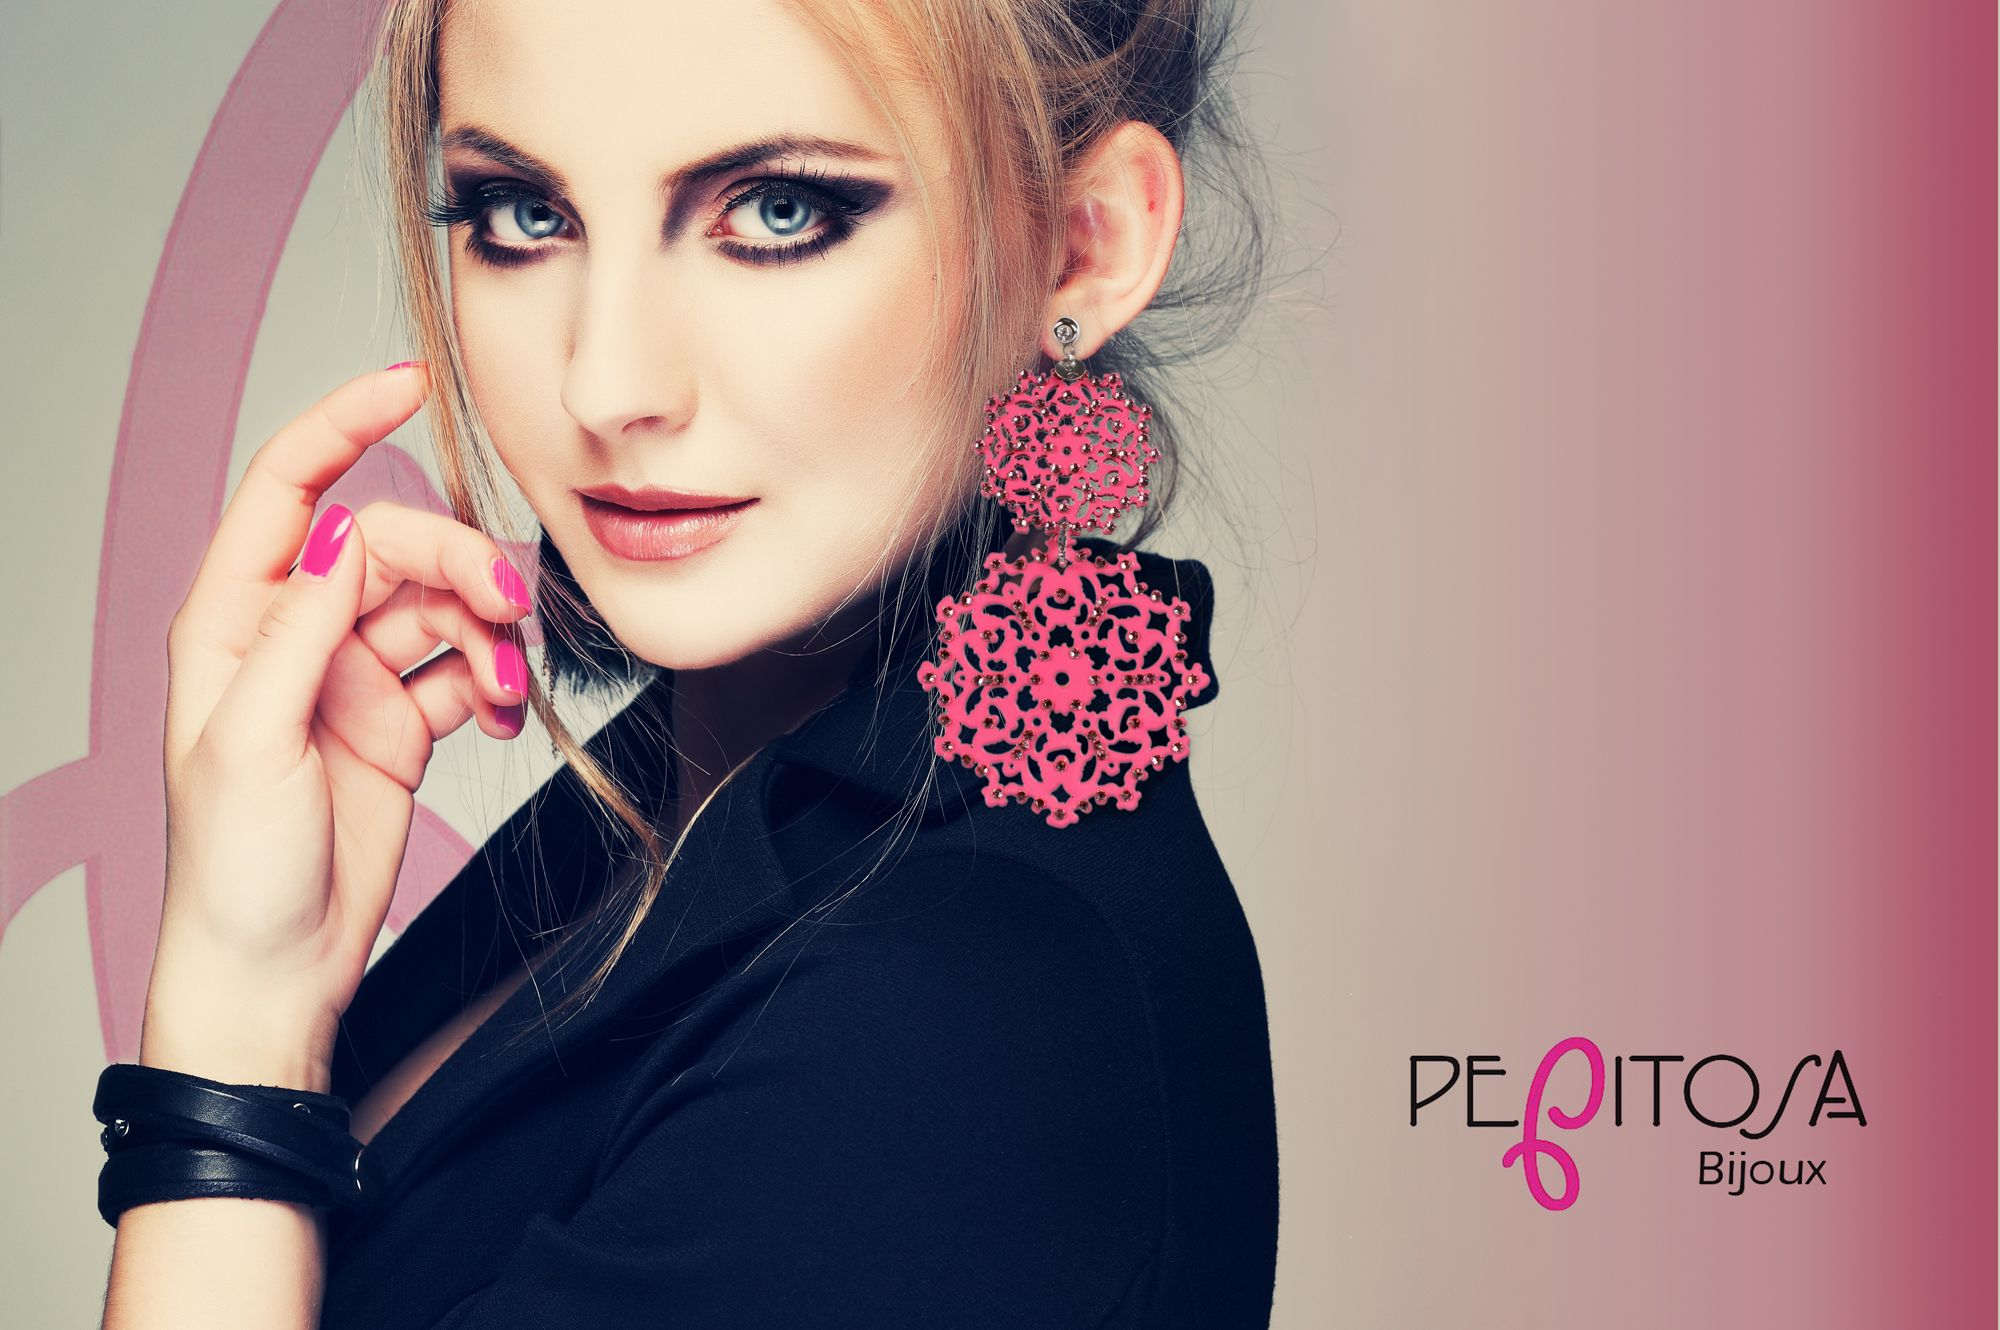 PEPITOSA su Giada&Co. http://www.giadaandco.com/designer-collection/pepitosa?___store=it #pepitosa #jewelry